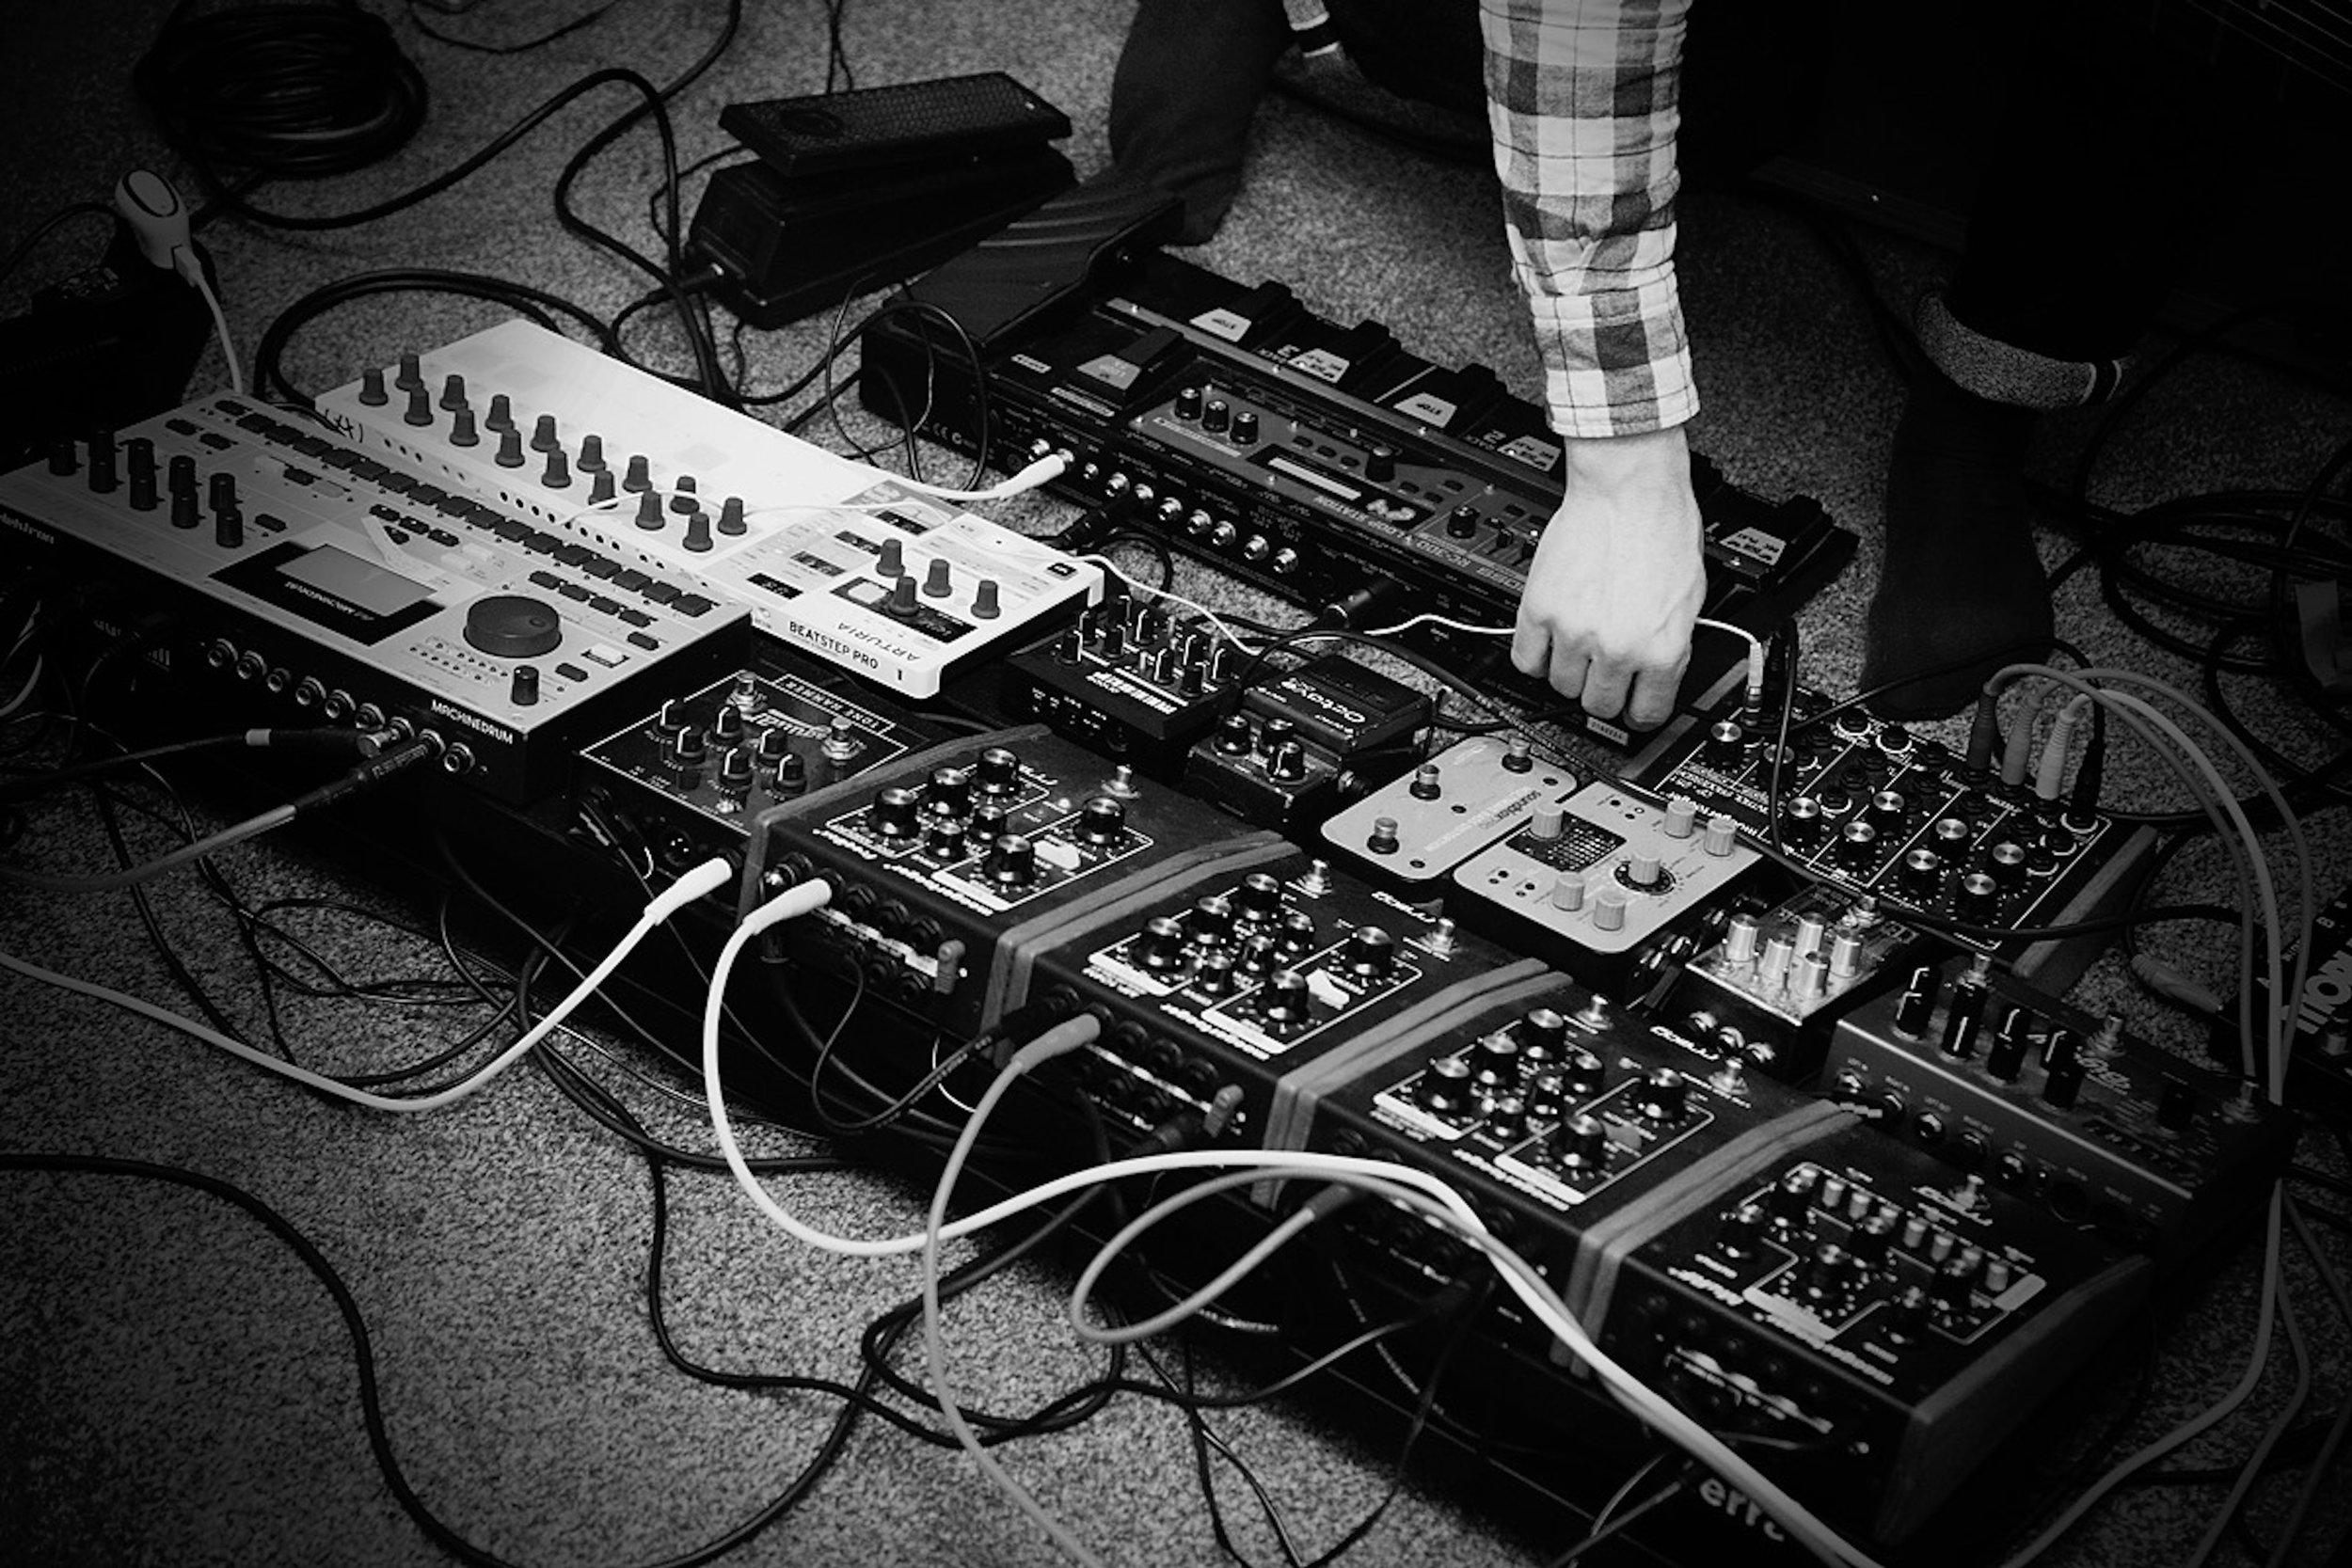 Tomasz Pierzchniak - Guitar Bass, Modular Synthesizer, Analog Electronic Effects